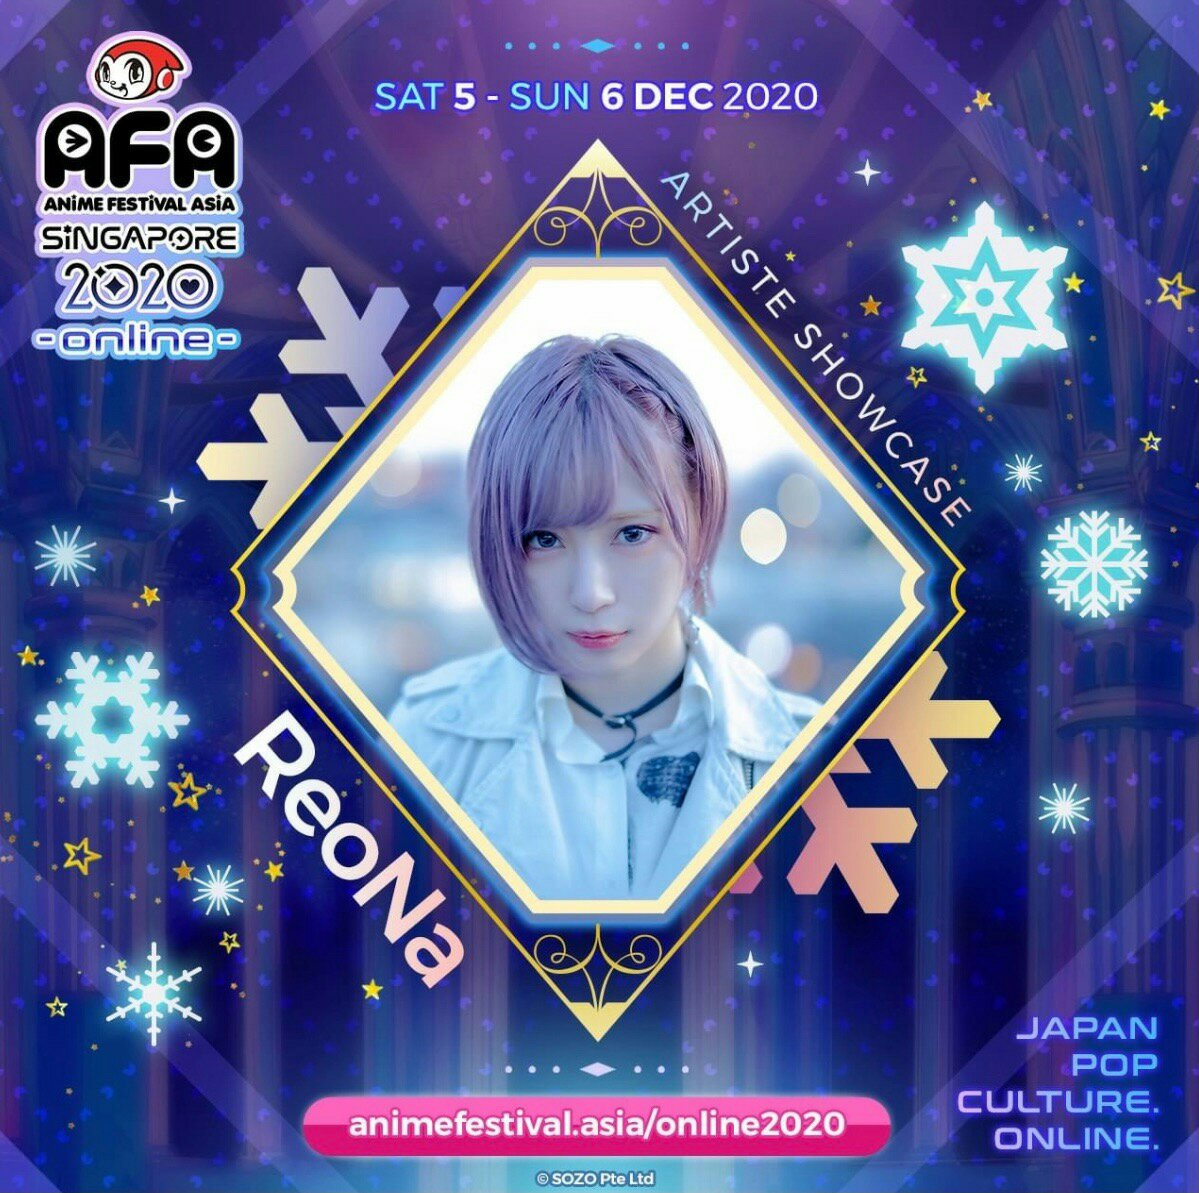 Japan Idol Group 22/7, Moona Hoshinova, Ayaka Ohashi, dan Lebih Banyak Lagi Musisi & Idol Favorit Tampil di Stage Virtual AFA! 7